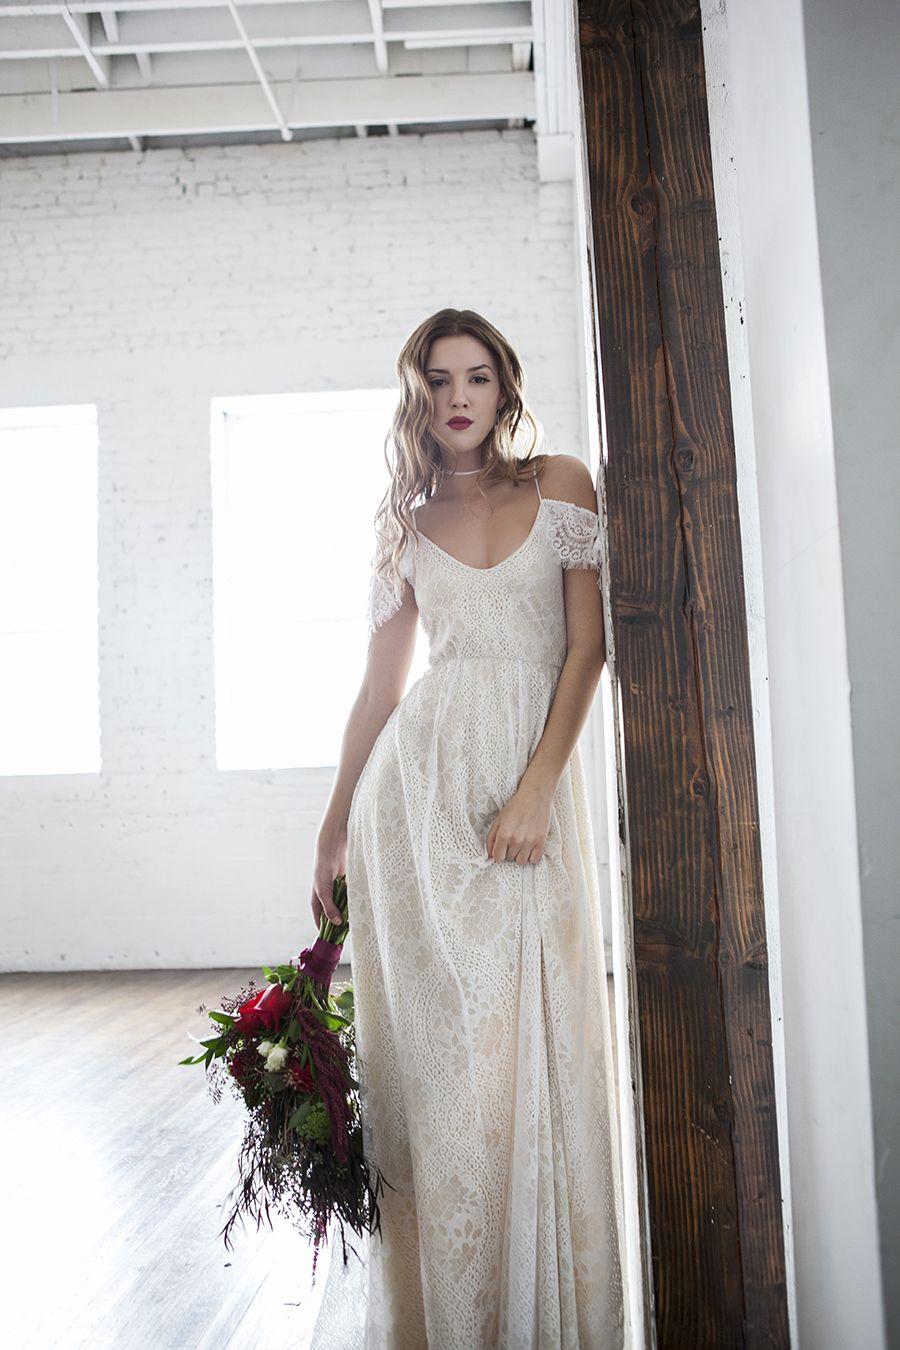 Japanese Lace Wedding Dress Paris Dress By Wear Your Love Off Shoulder Wedding Dress Cold Shoulder Wedding Dress Wedding Dresses Vintage Bohemian